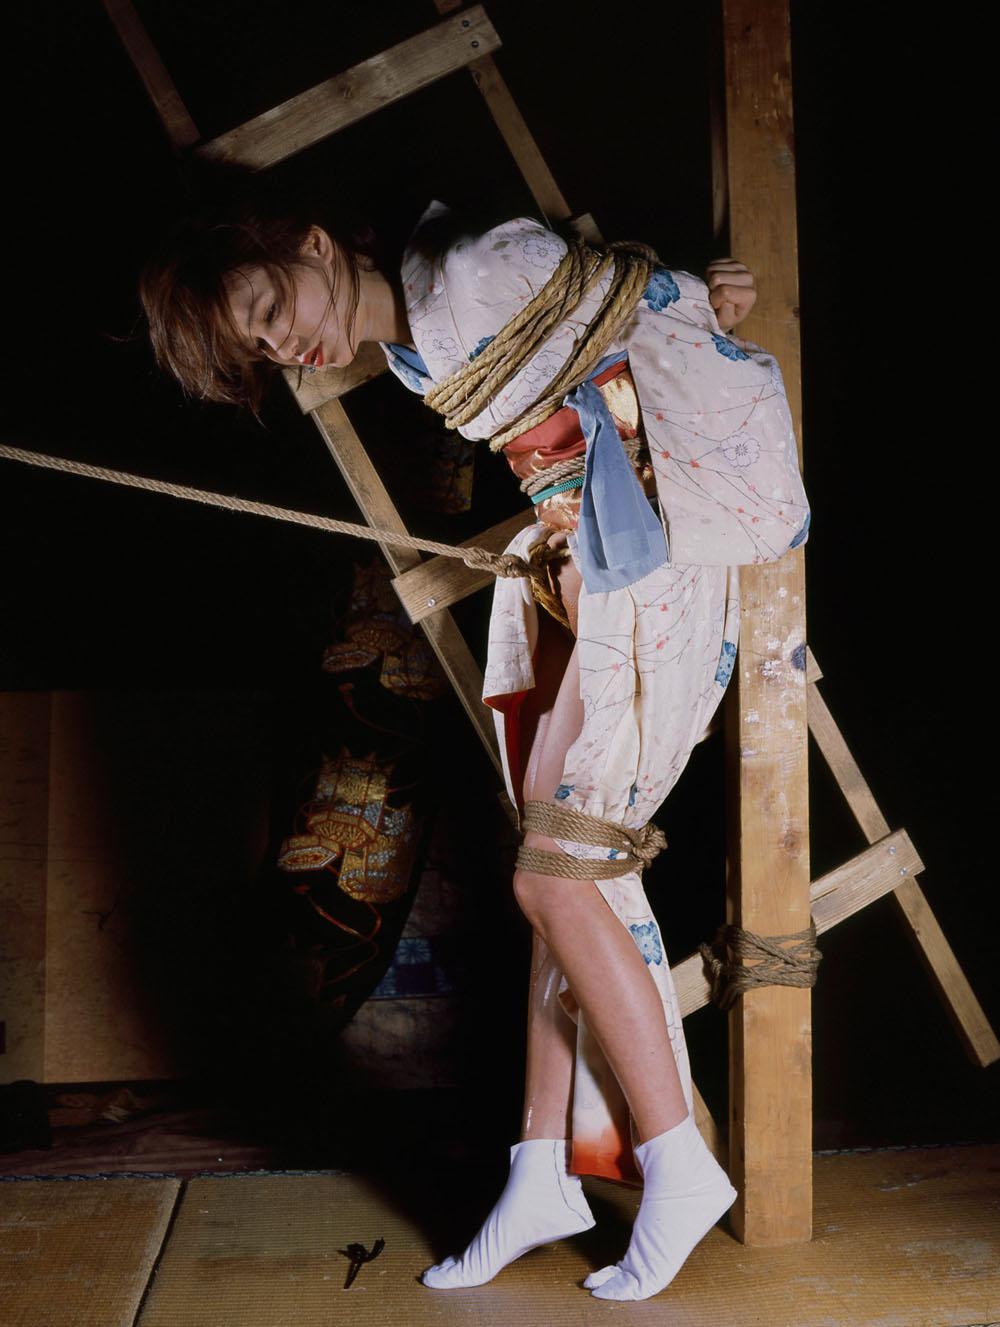 【SMエロ画像】昔の拷問っぽくて酷w着物姿の女性を緊縛して徹底調教www 19